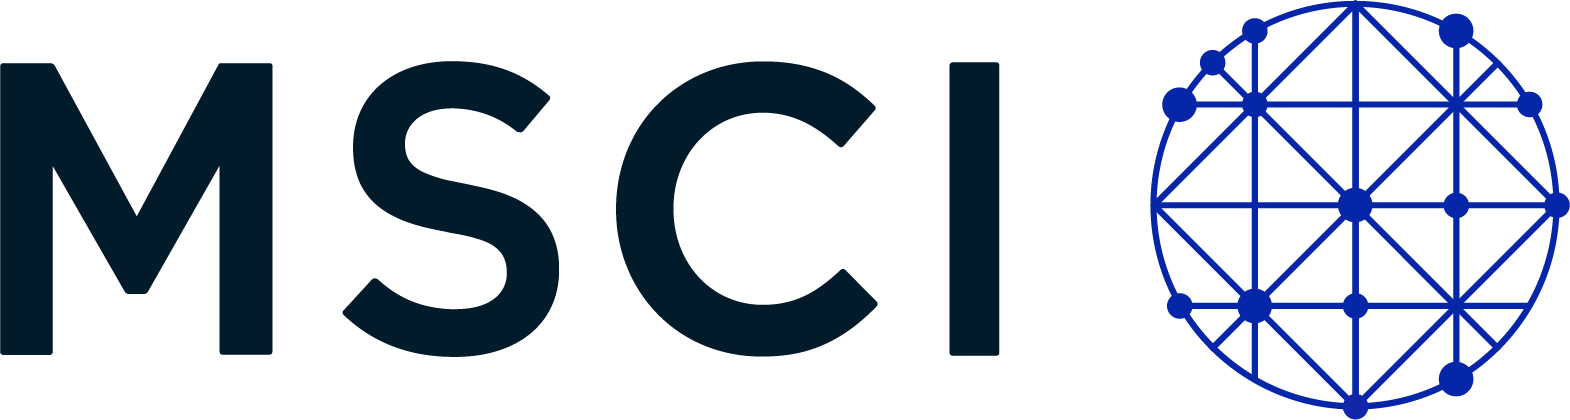 MSCI Logo png